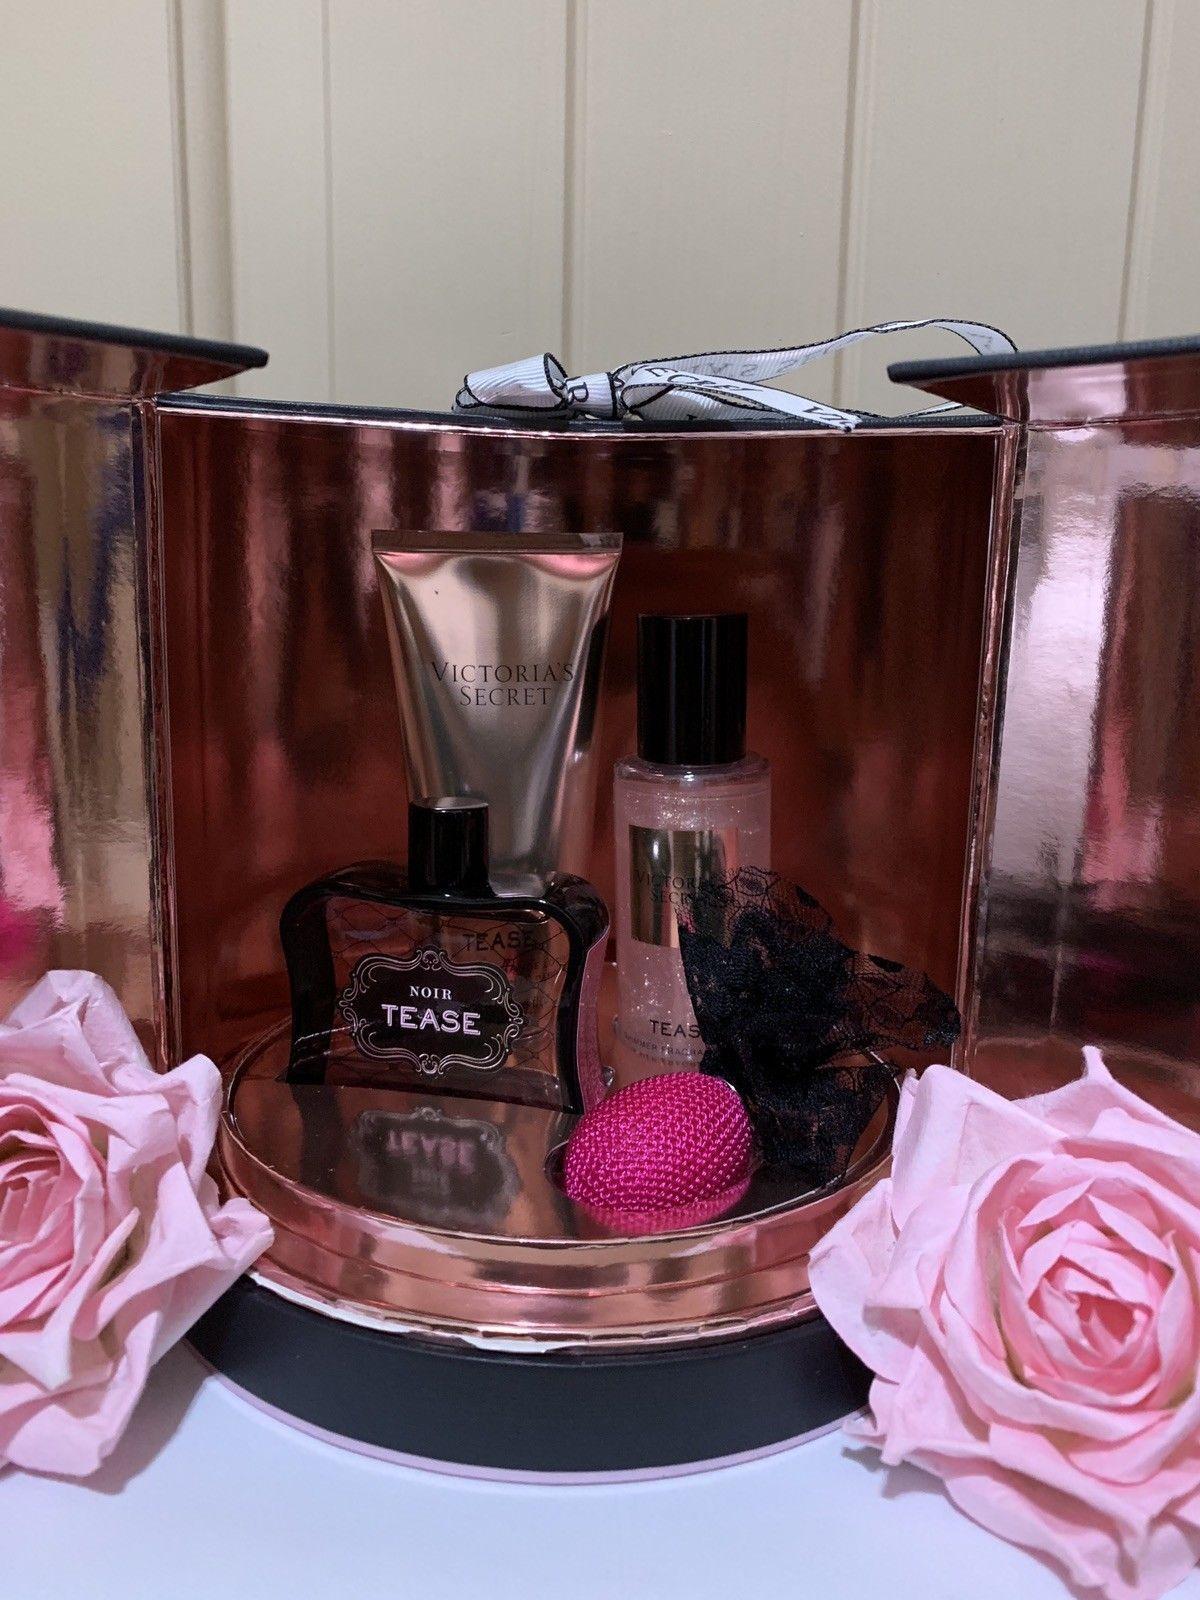 Victoria's Secret NOIR Tease Perfume 3 PC Gift Set 1.7 oz EDP B-Lotion, Mist SPR